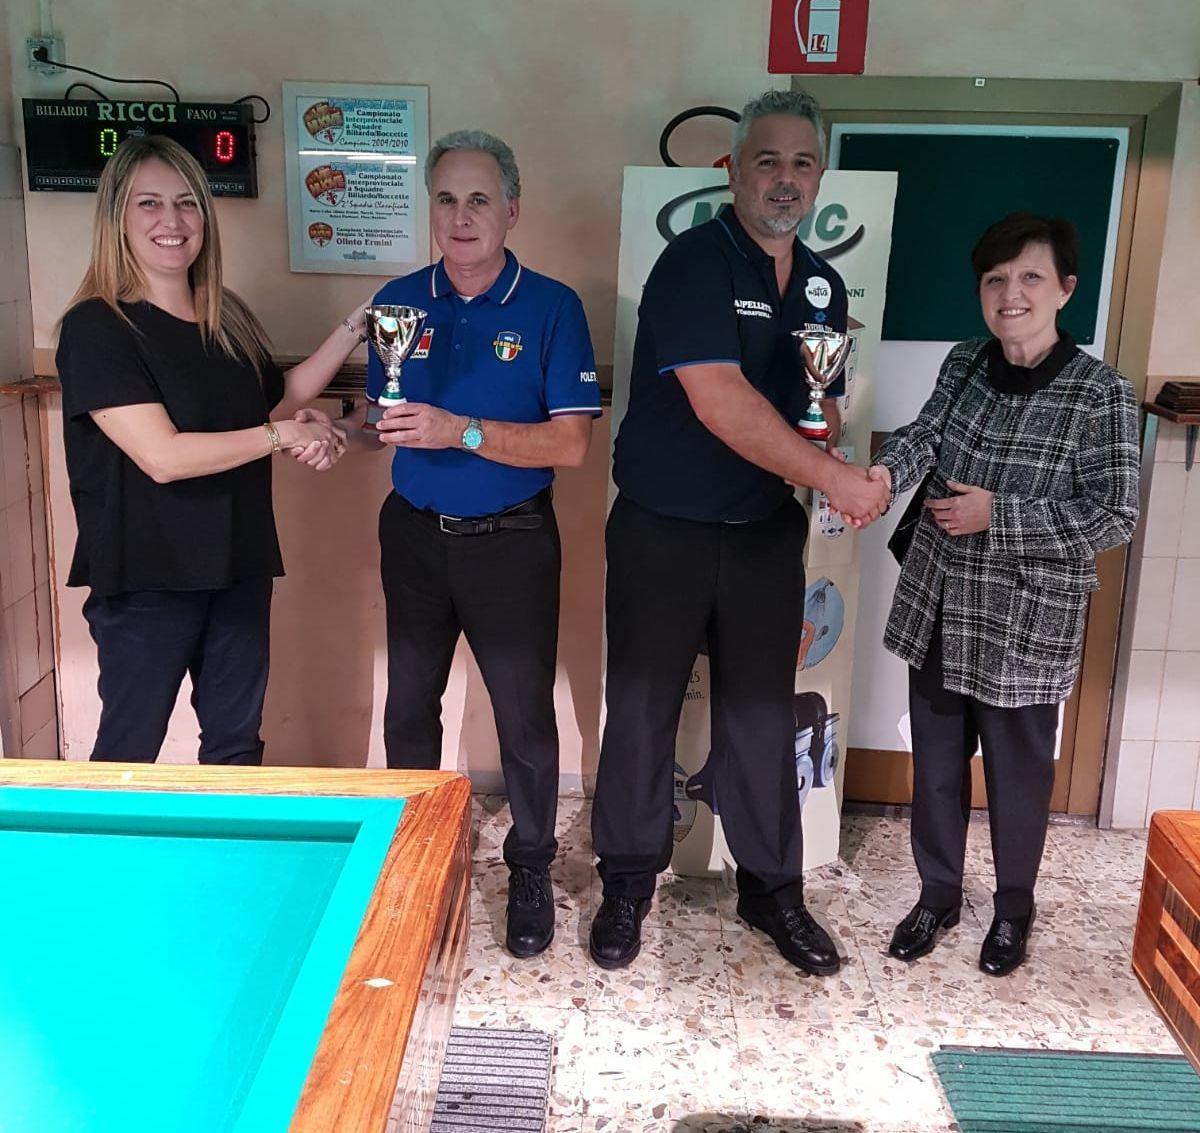 Serena Falchetti, Francesco Poletto, Stefano Nanni e Alessandra Benini